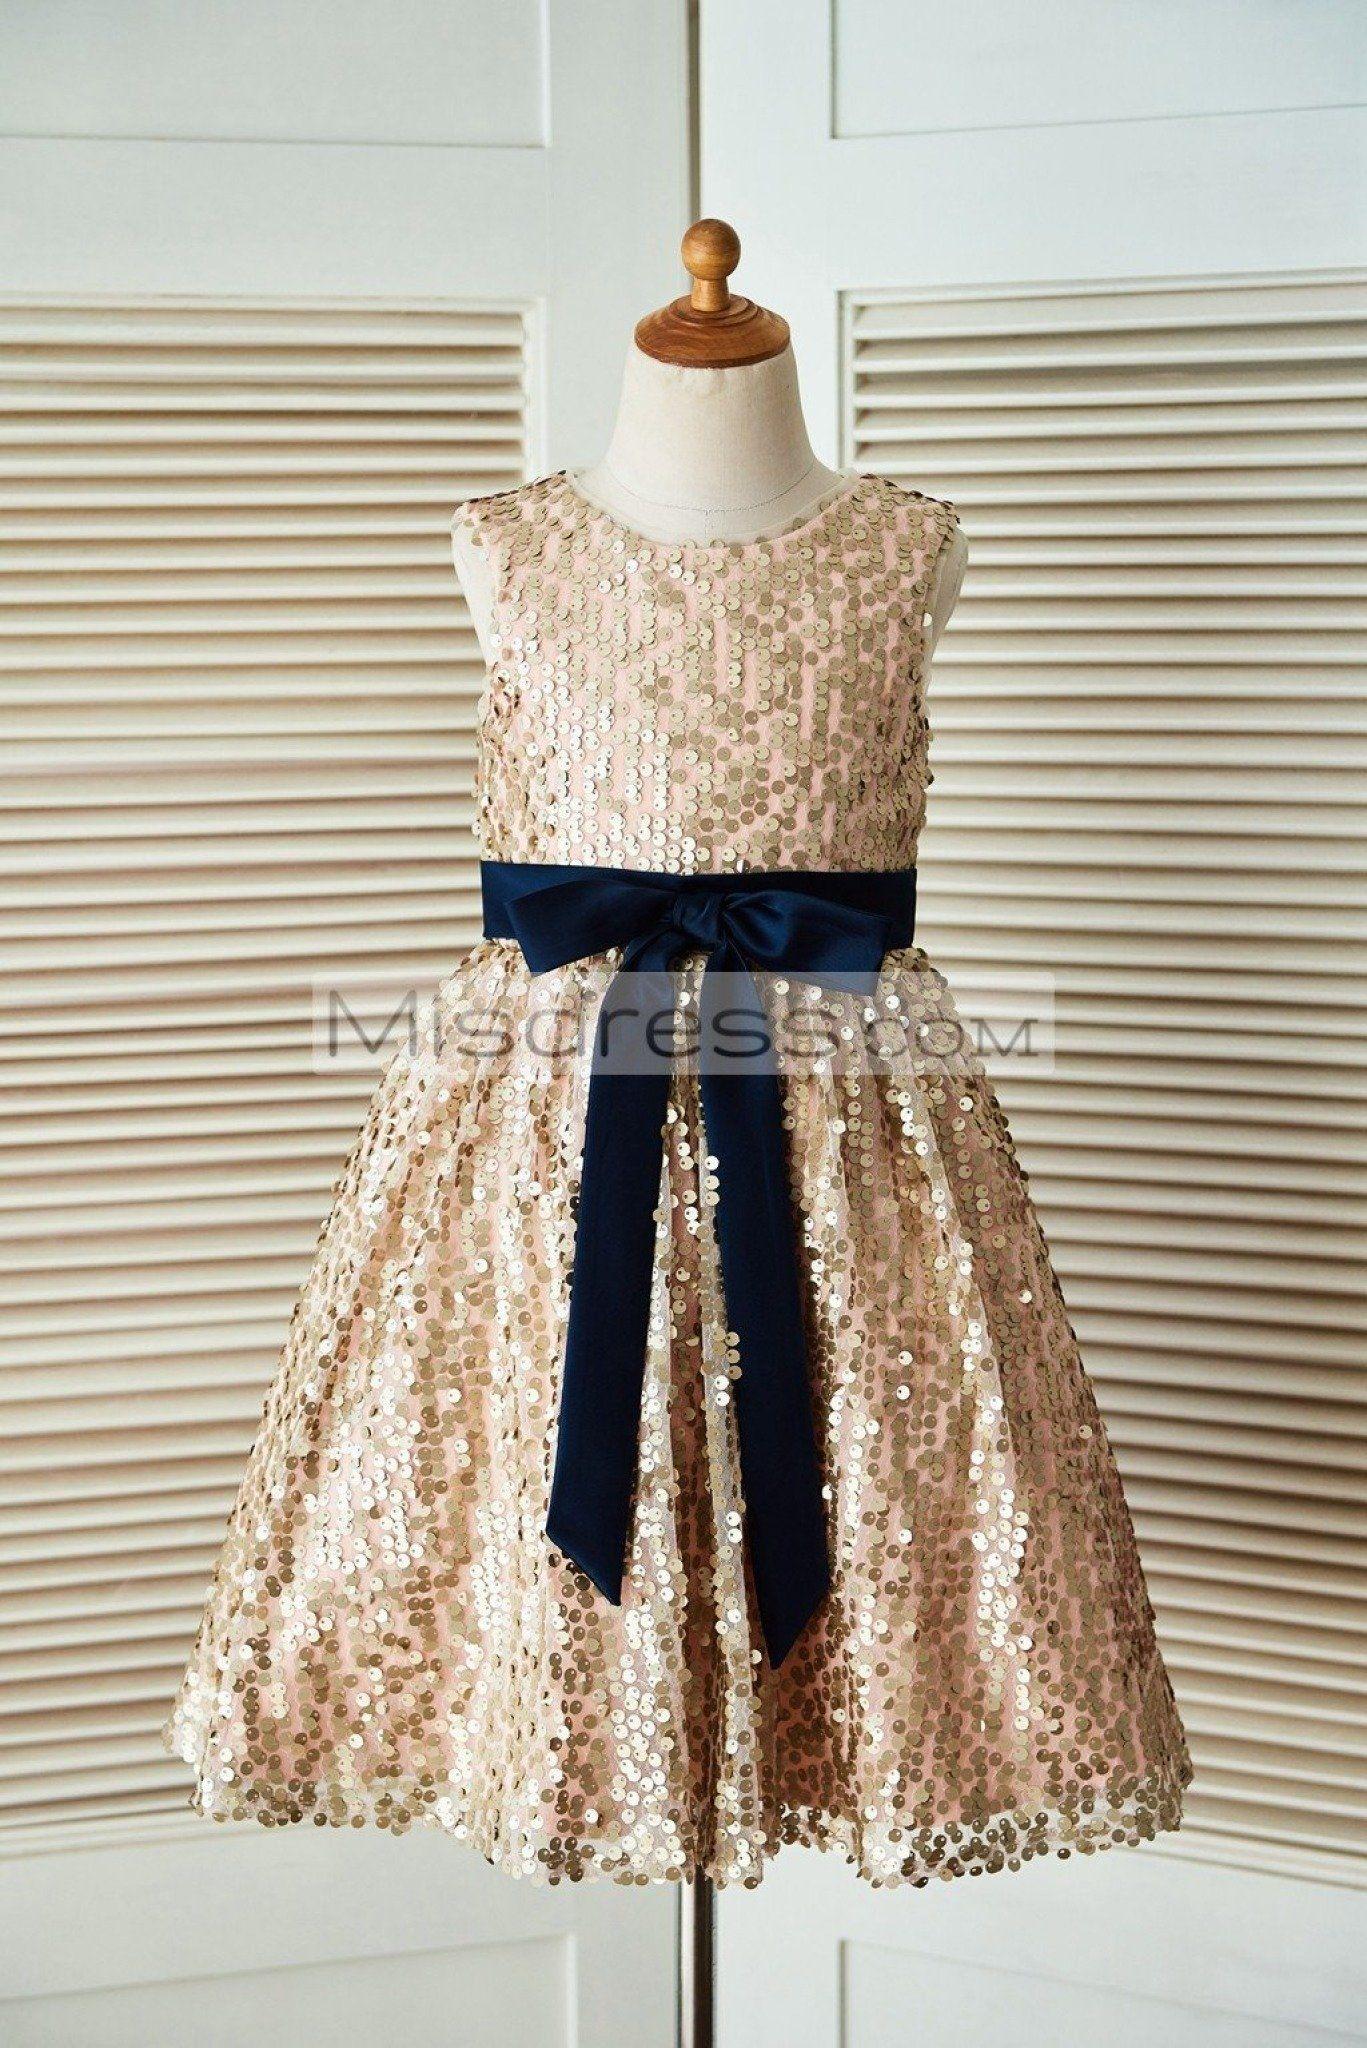 85626defc Champagne Gold Sequin Wedding Flower Girl Dress with Navy Blue Belt SKU:  K1003304 Buy Now: #flowergirldress #wedding #littlegirldress  #champagnedress # ...